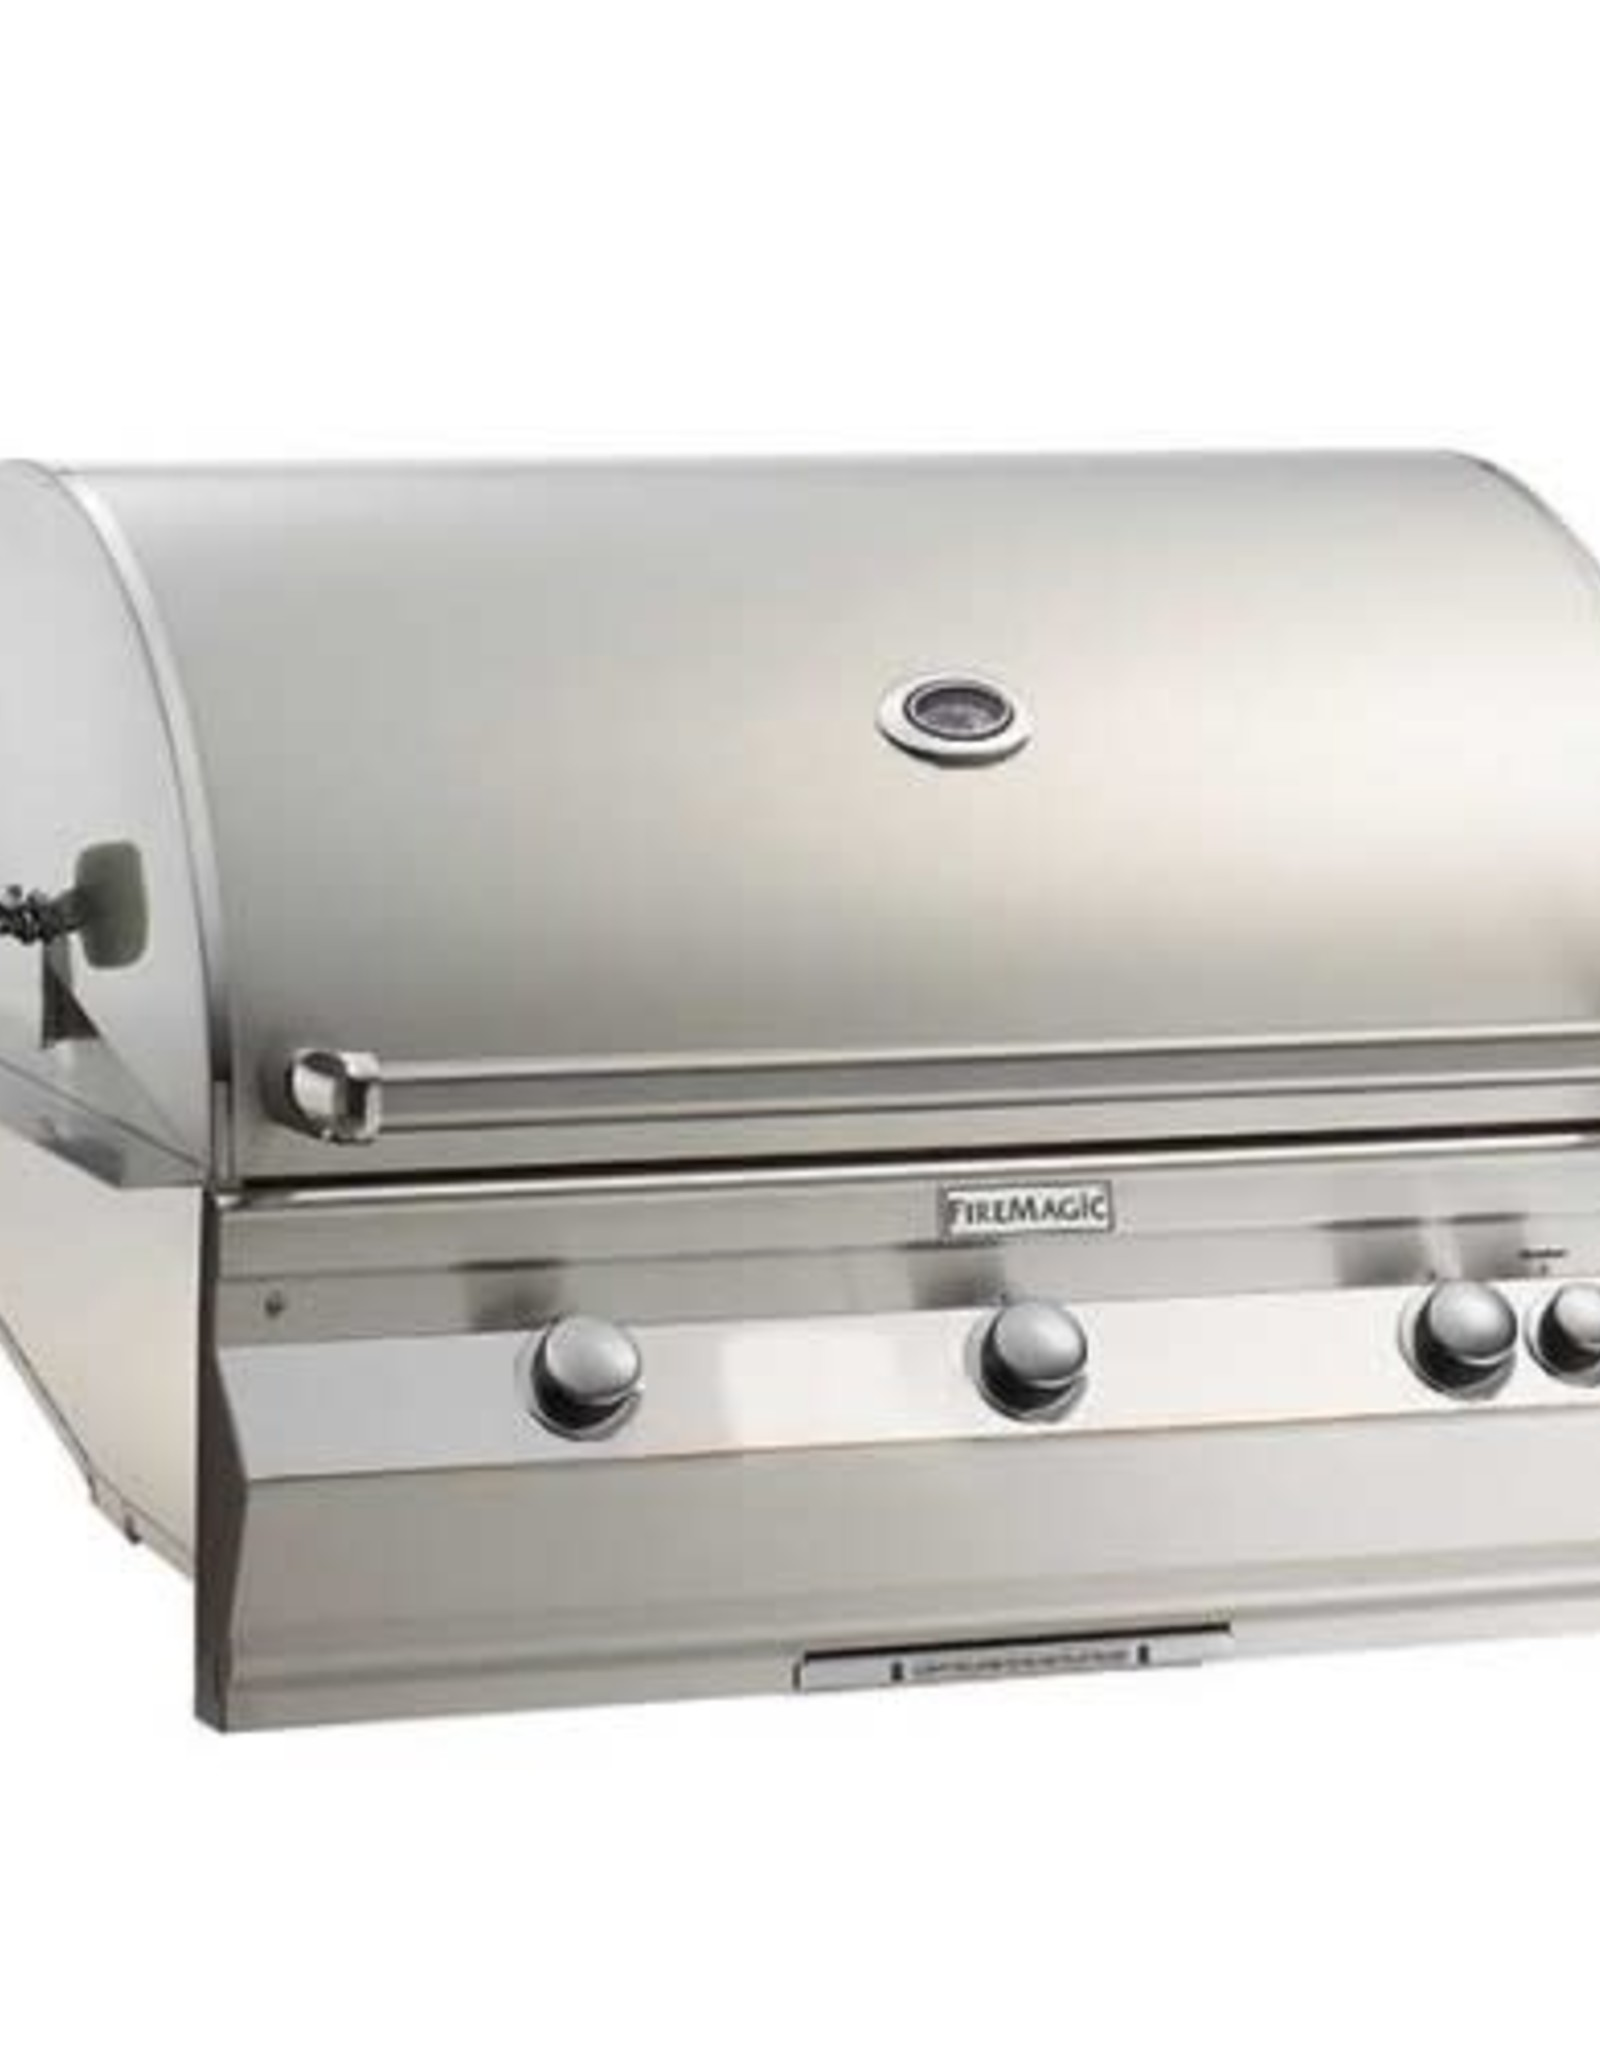 Fire Magic Fire Magic - Aurora A790i 36-inch Built-In Grill with Rotisserie